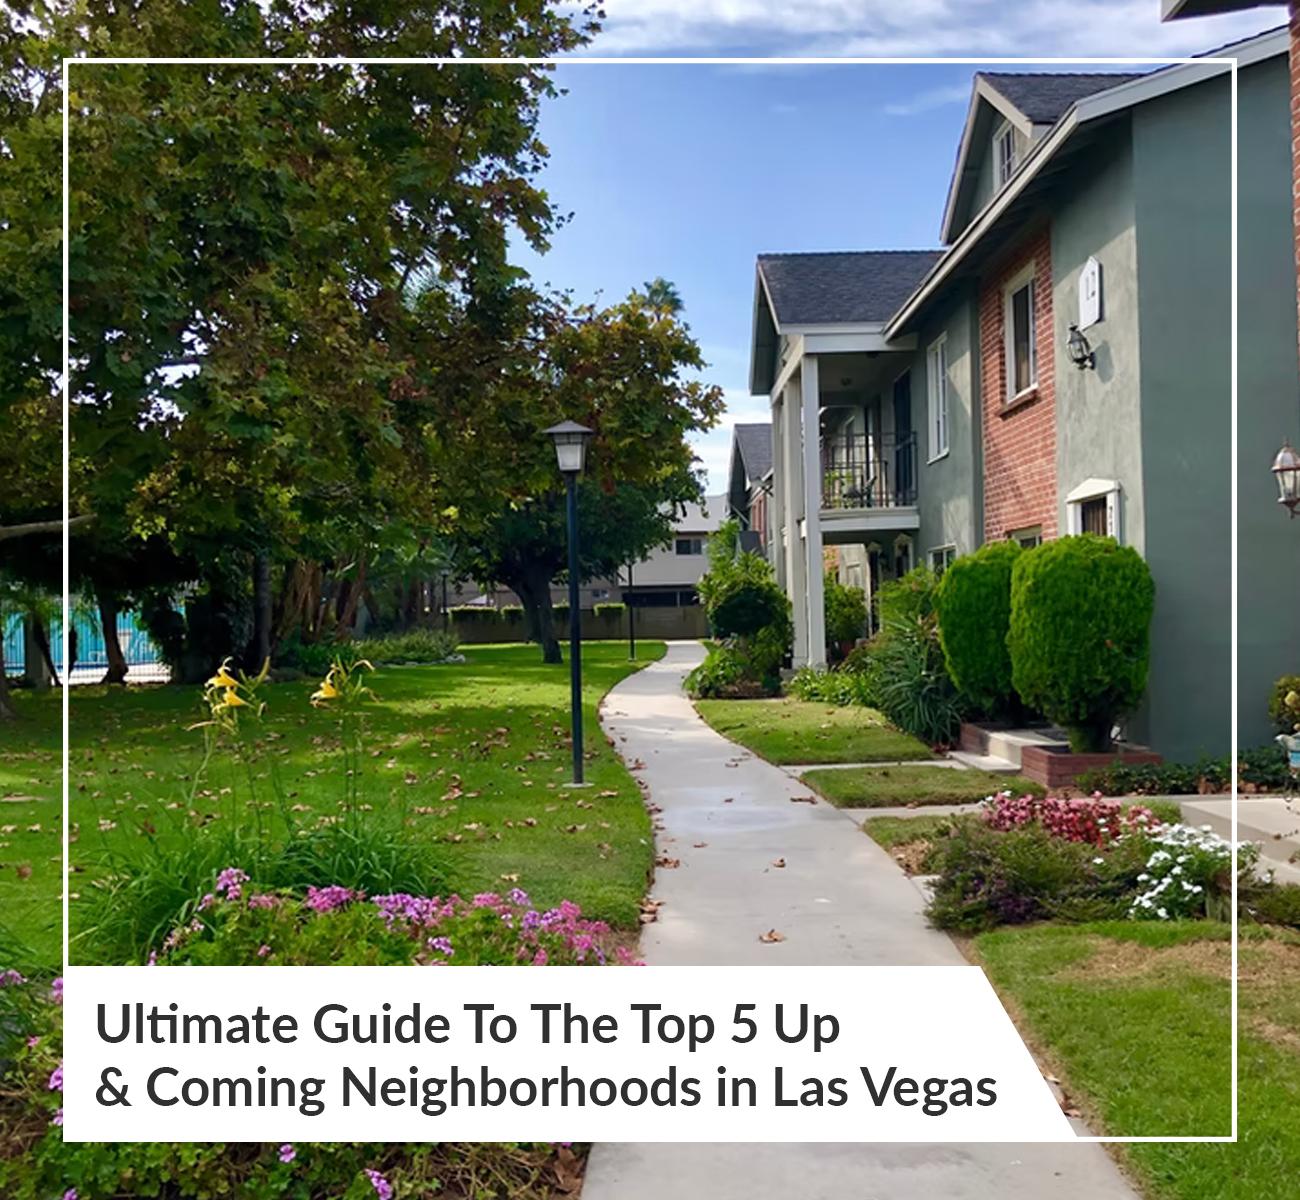 Up and Coming Las Vegas Neighborhoods